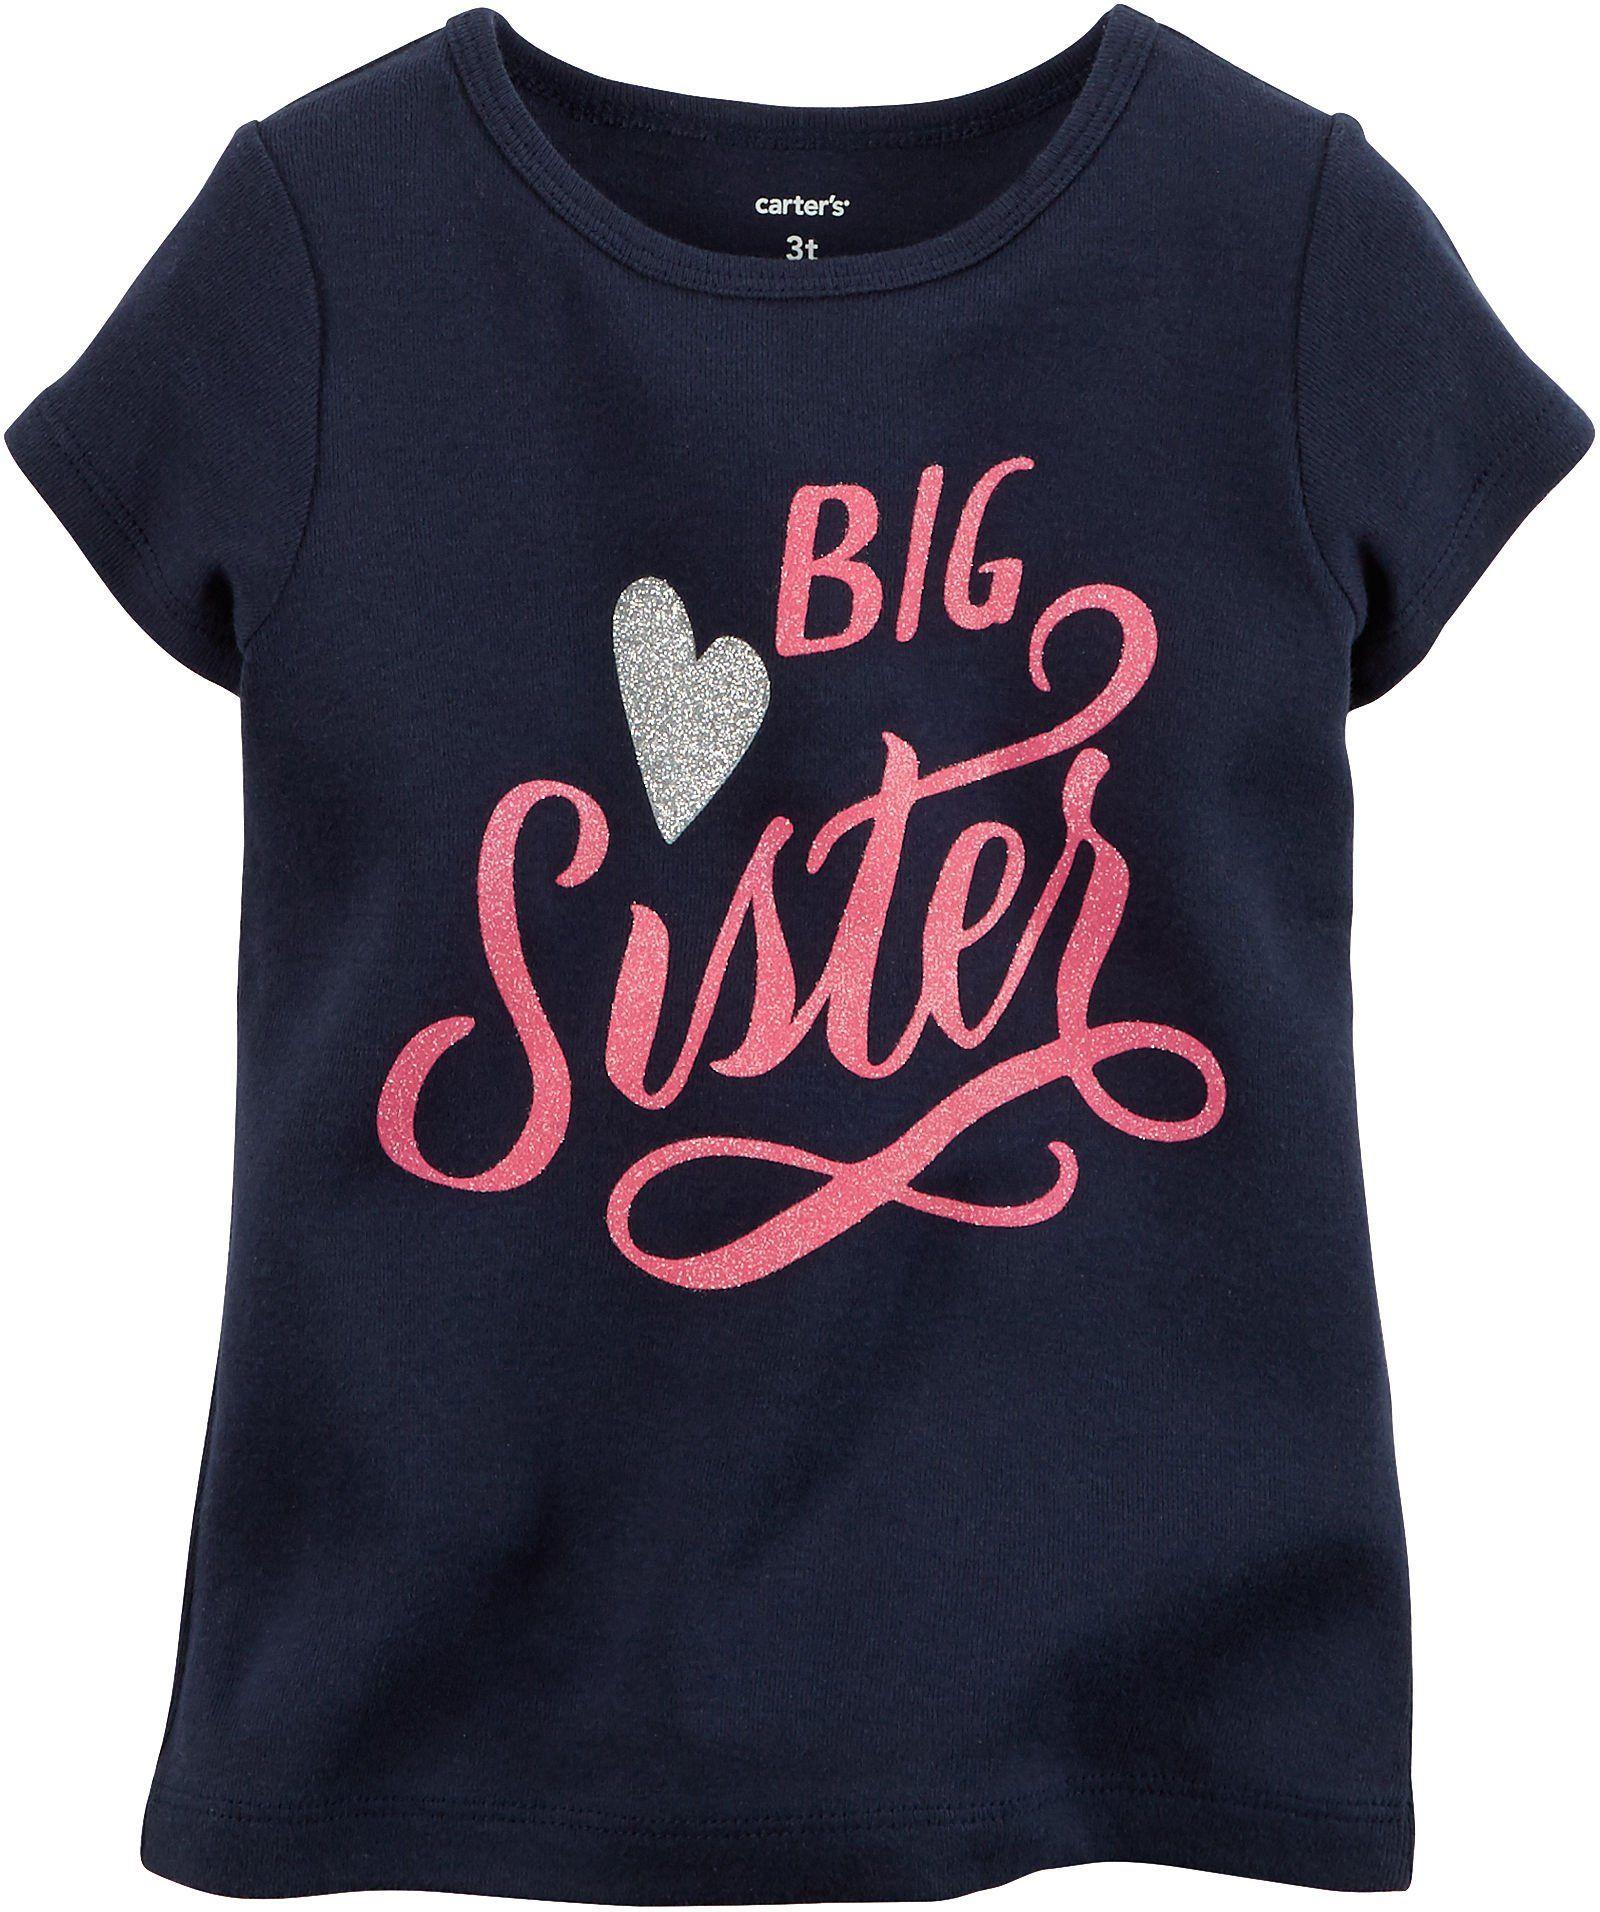 514bbd5e9 Carters Little Girls Big Sister T-Shirt 6 Blue | Shhh we are having ...